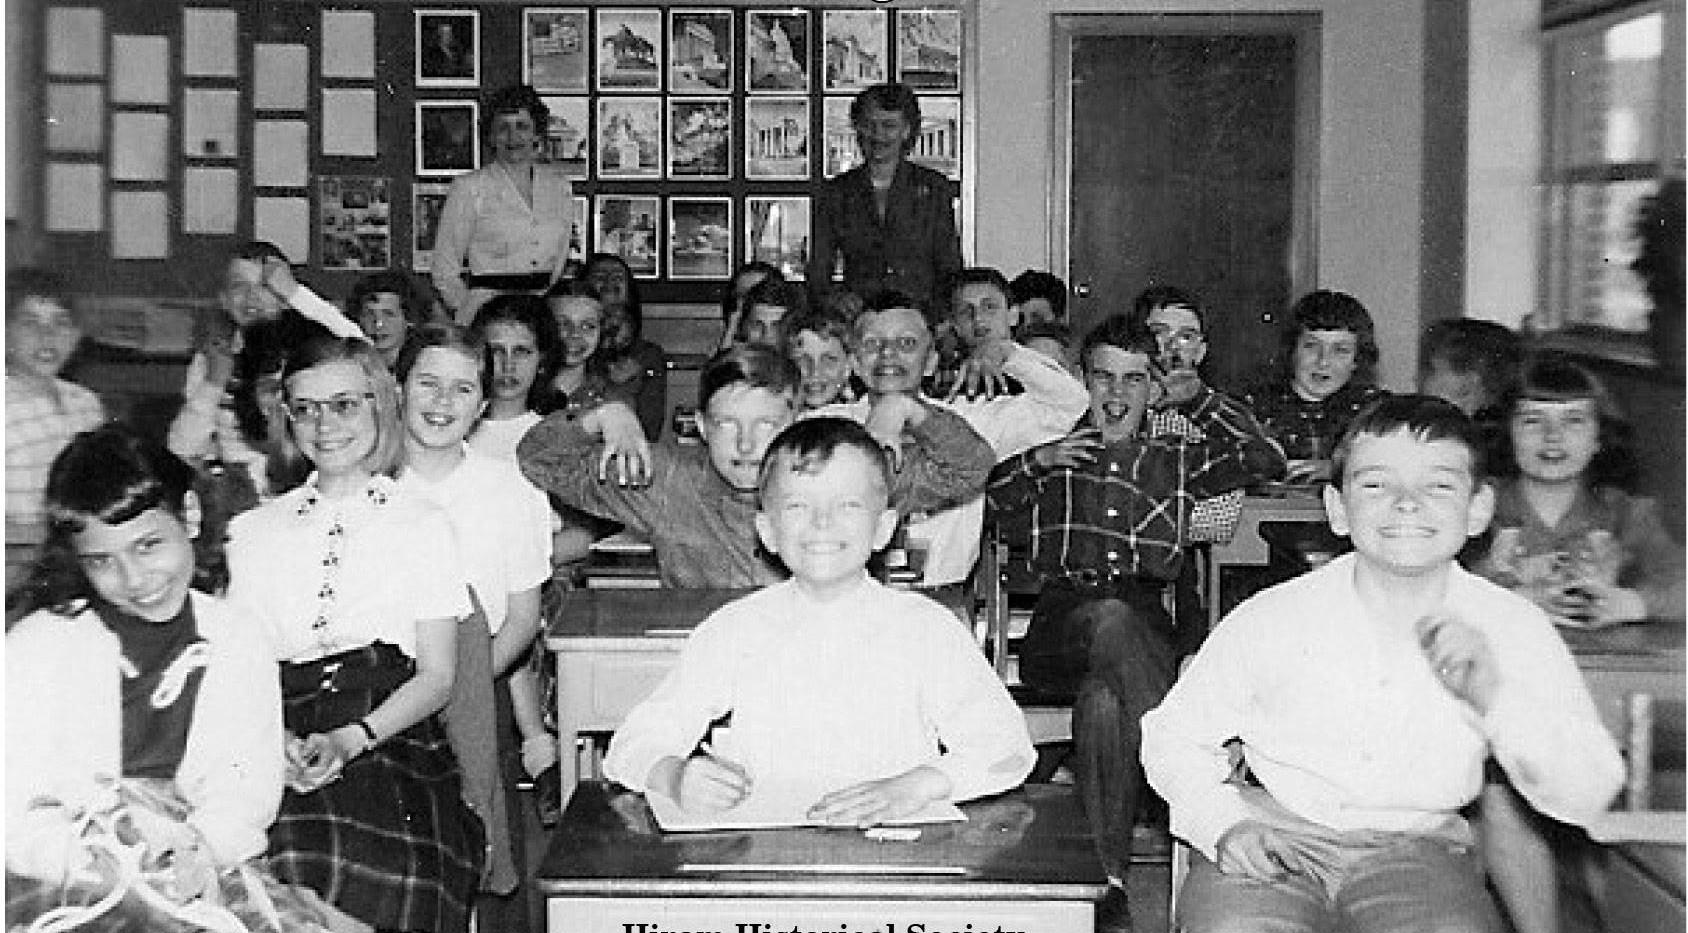 Porter Maine Elementry School 1953